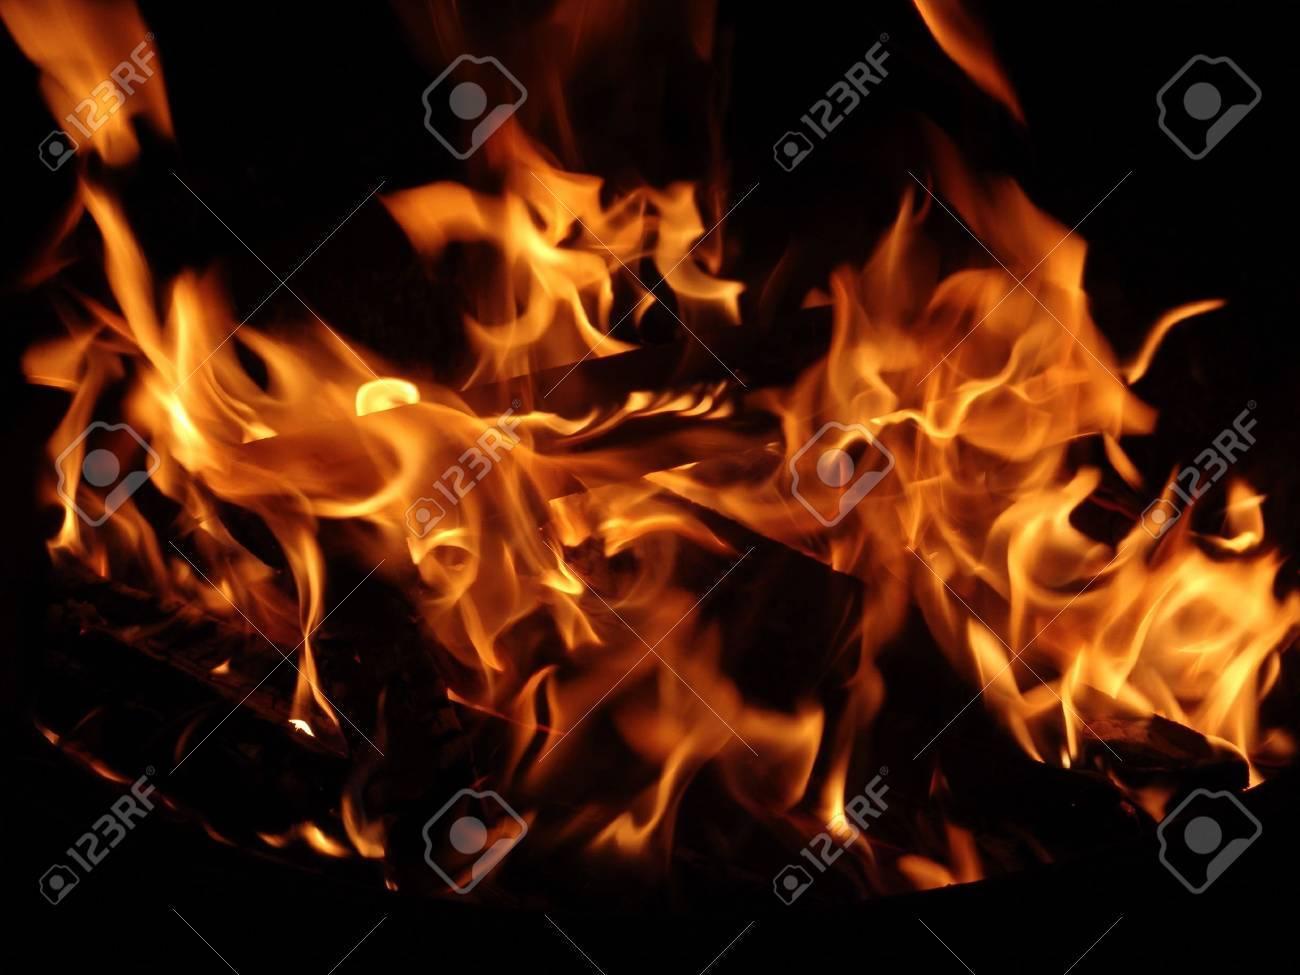 Vivid fire in dark - 5426343